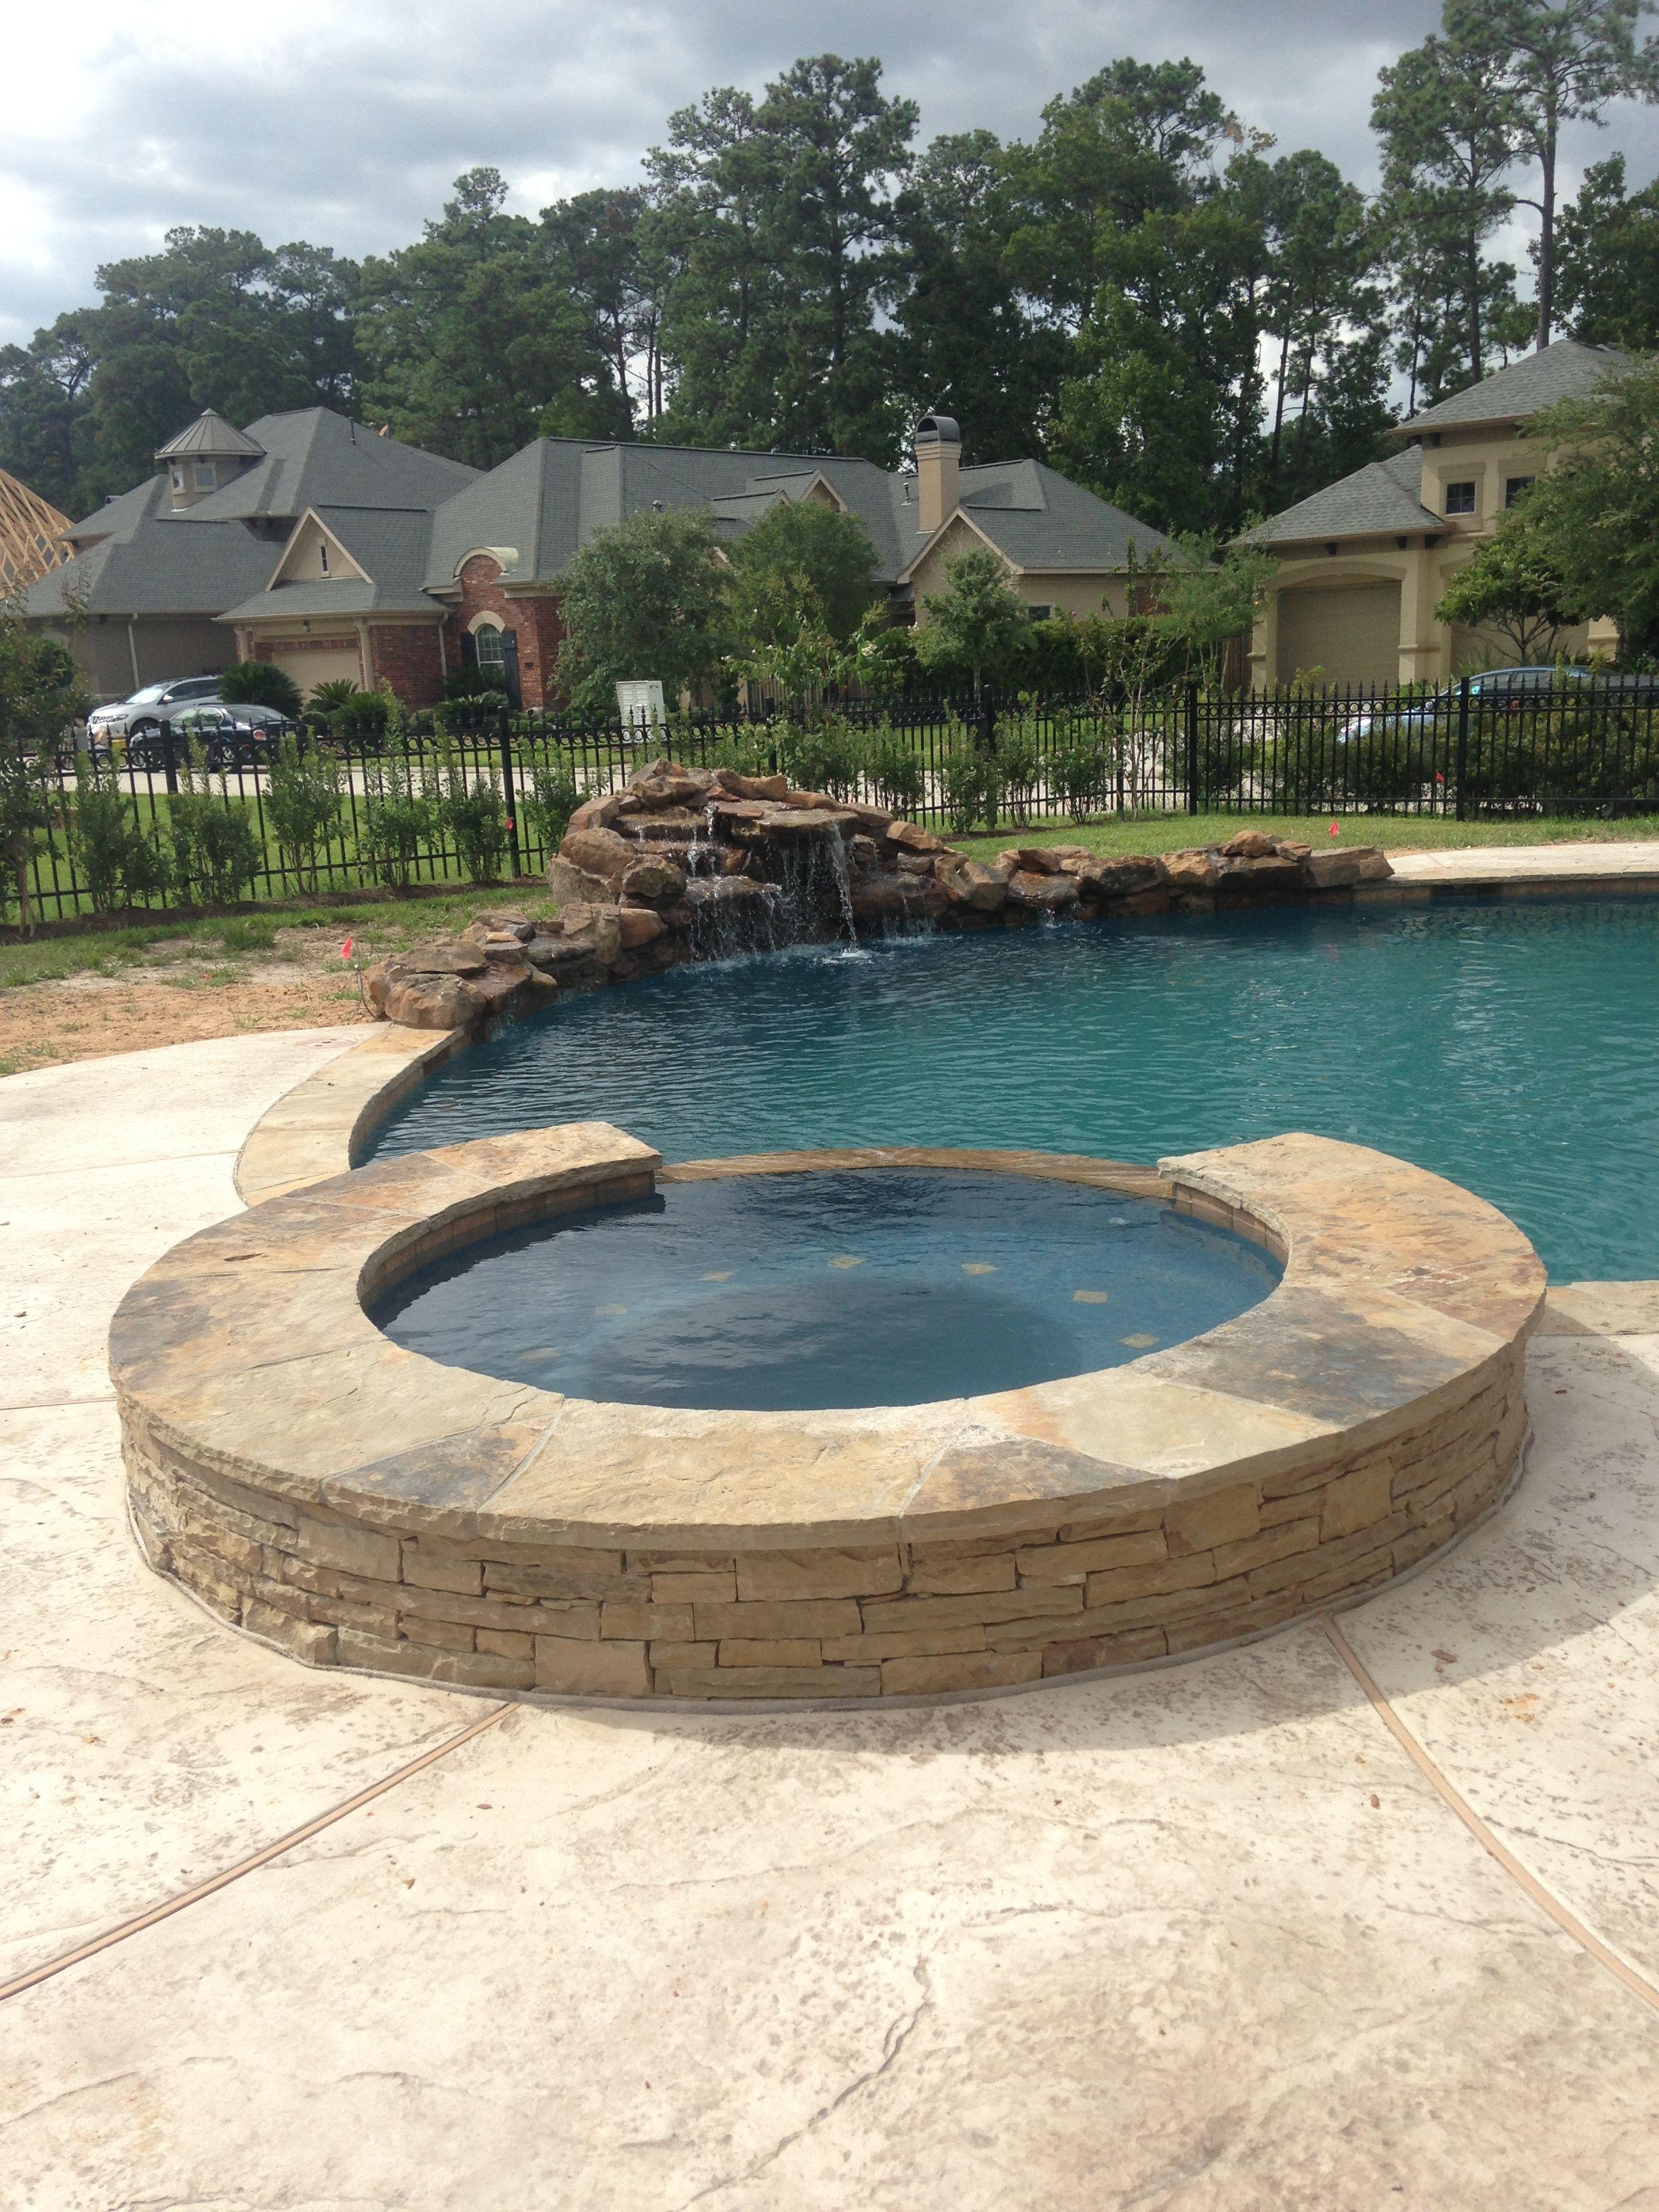 Inground swimming pool Stacked stone raised spa